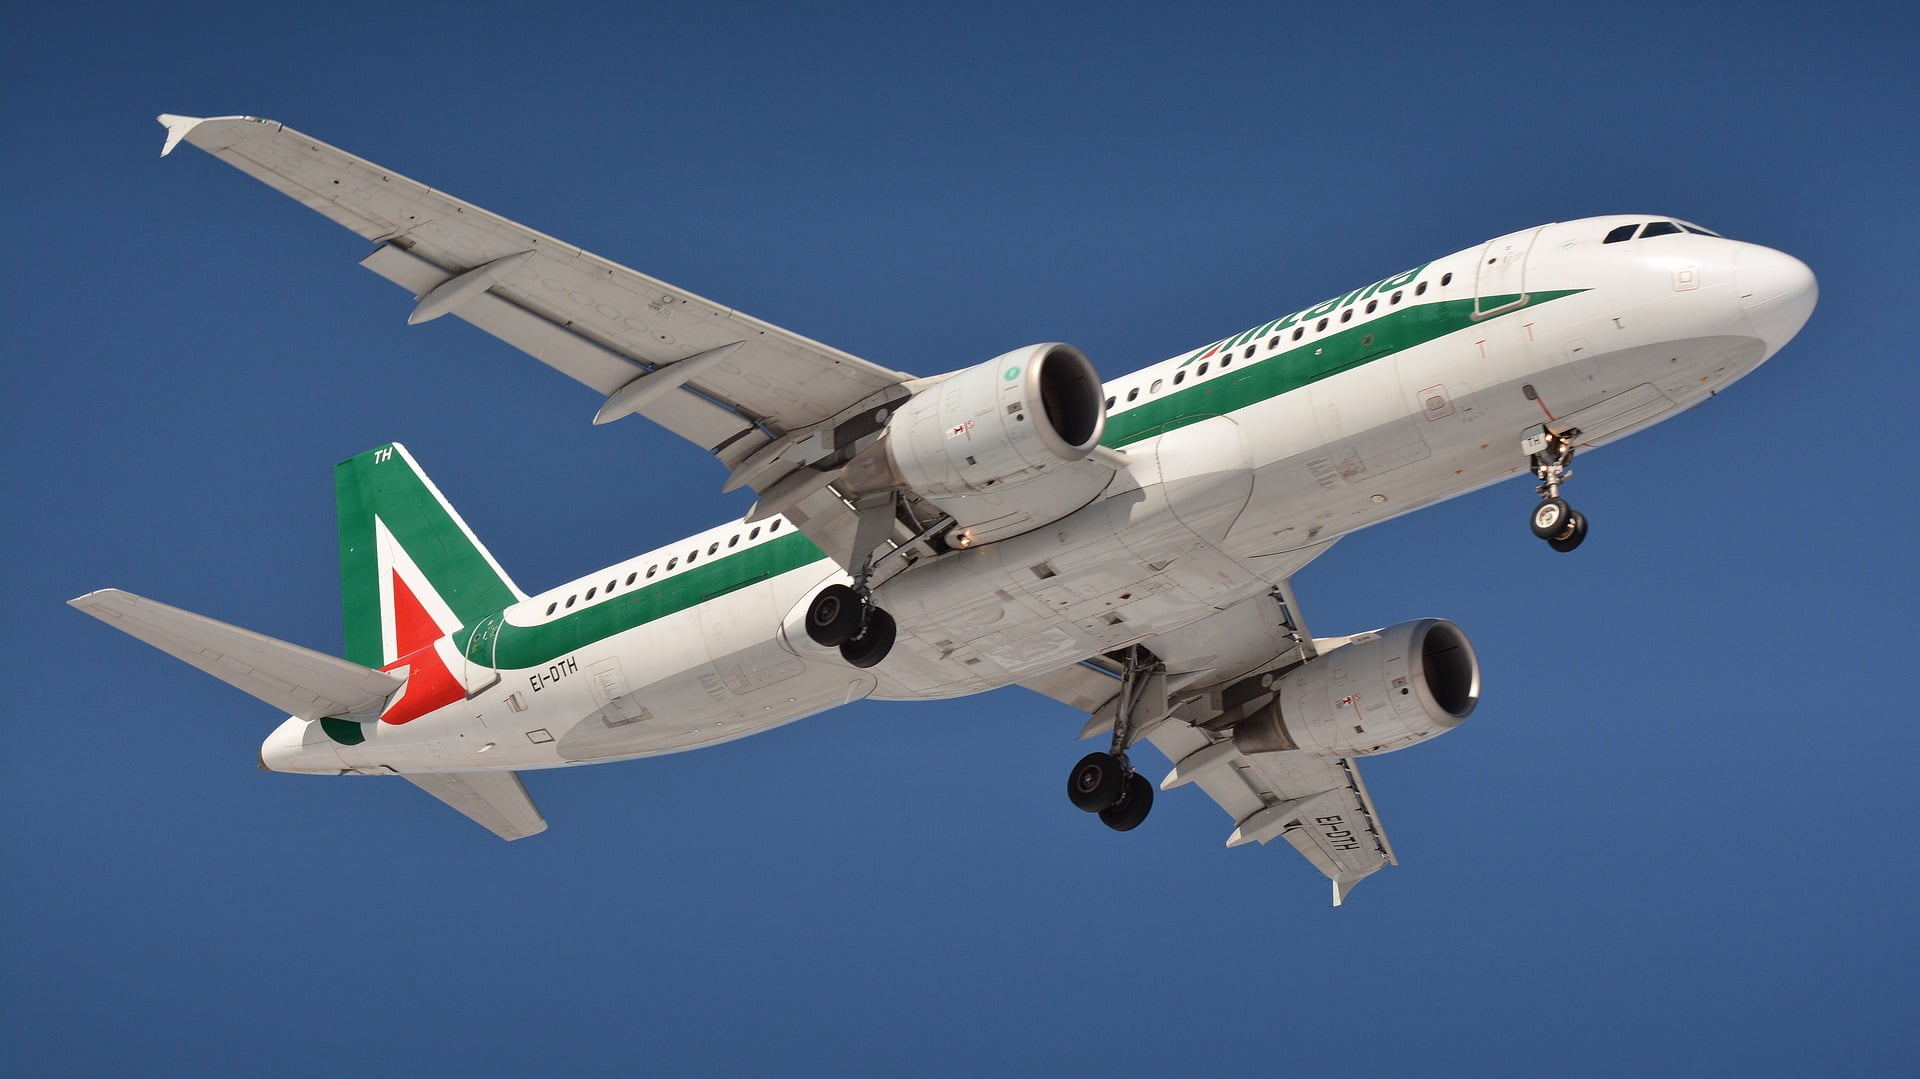 the plane 3352694 1920